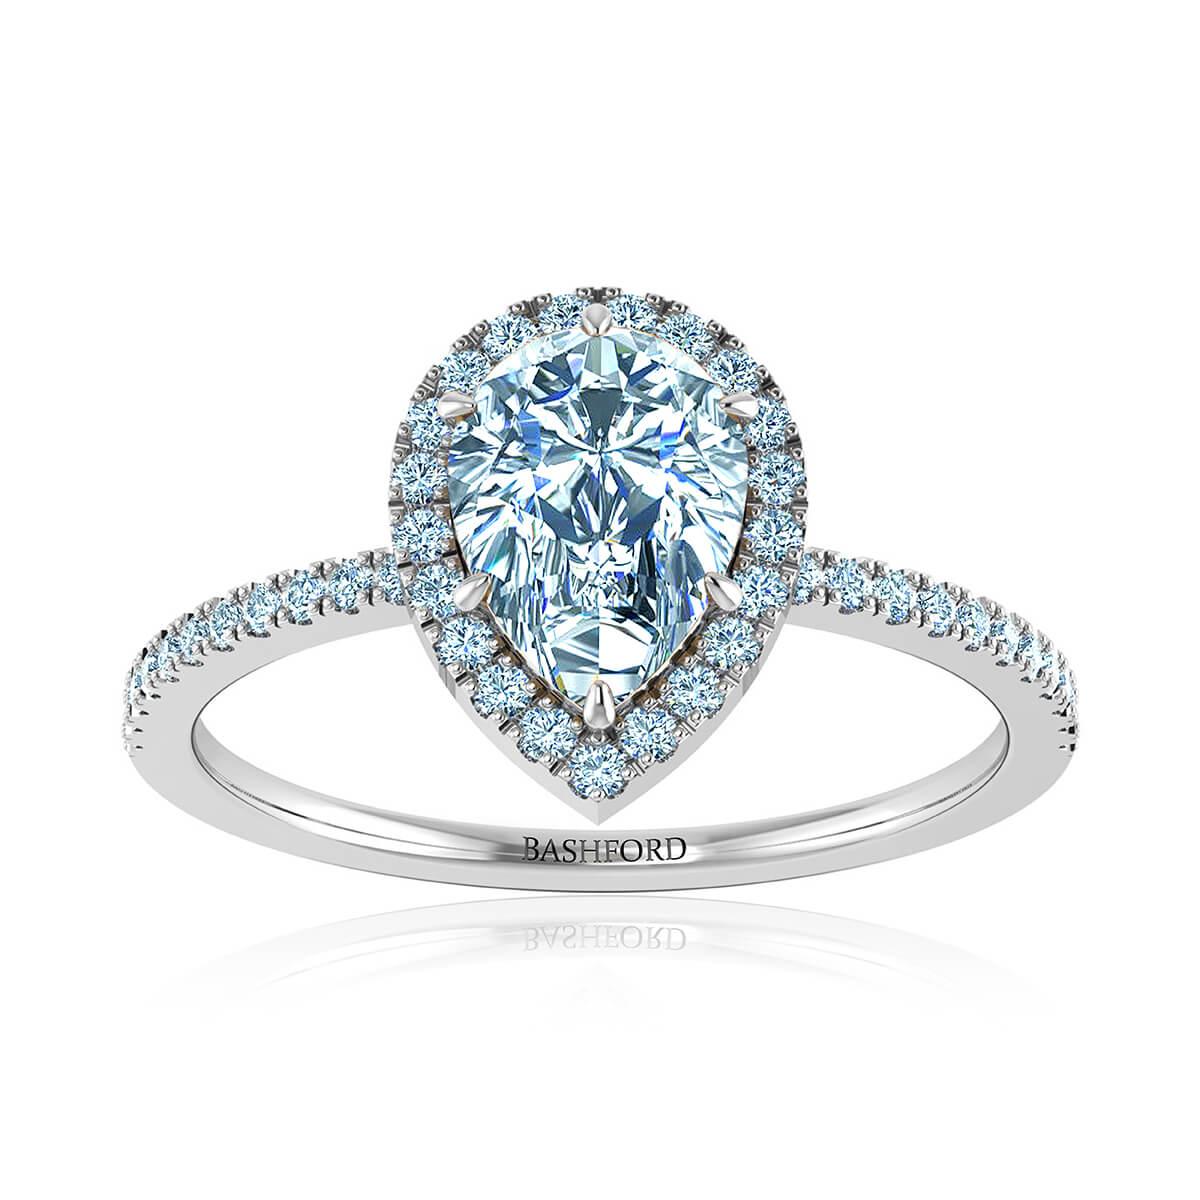 J'adore Diamond Ring